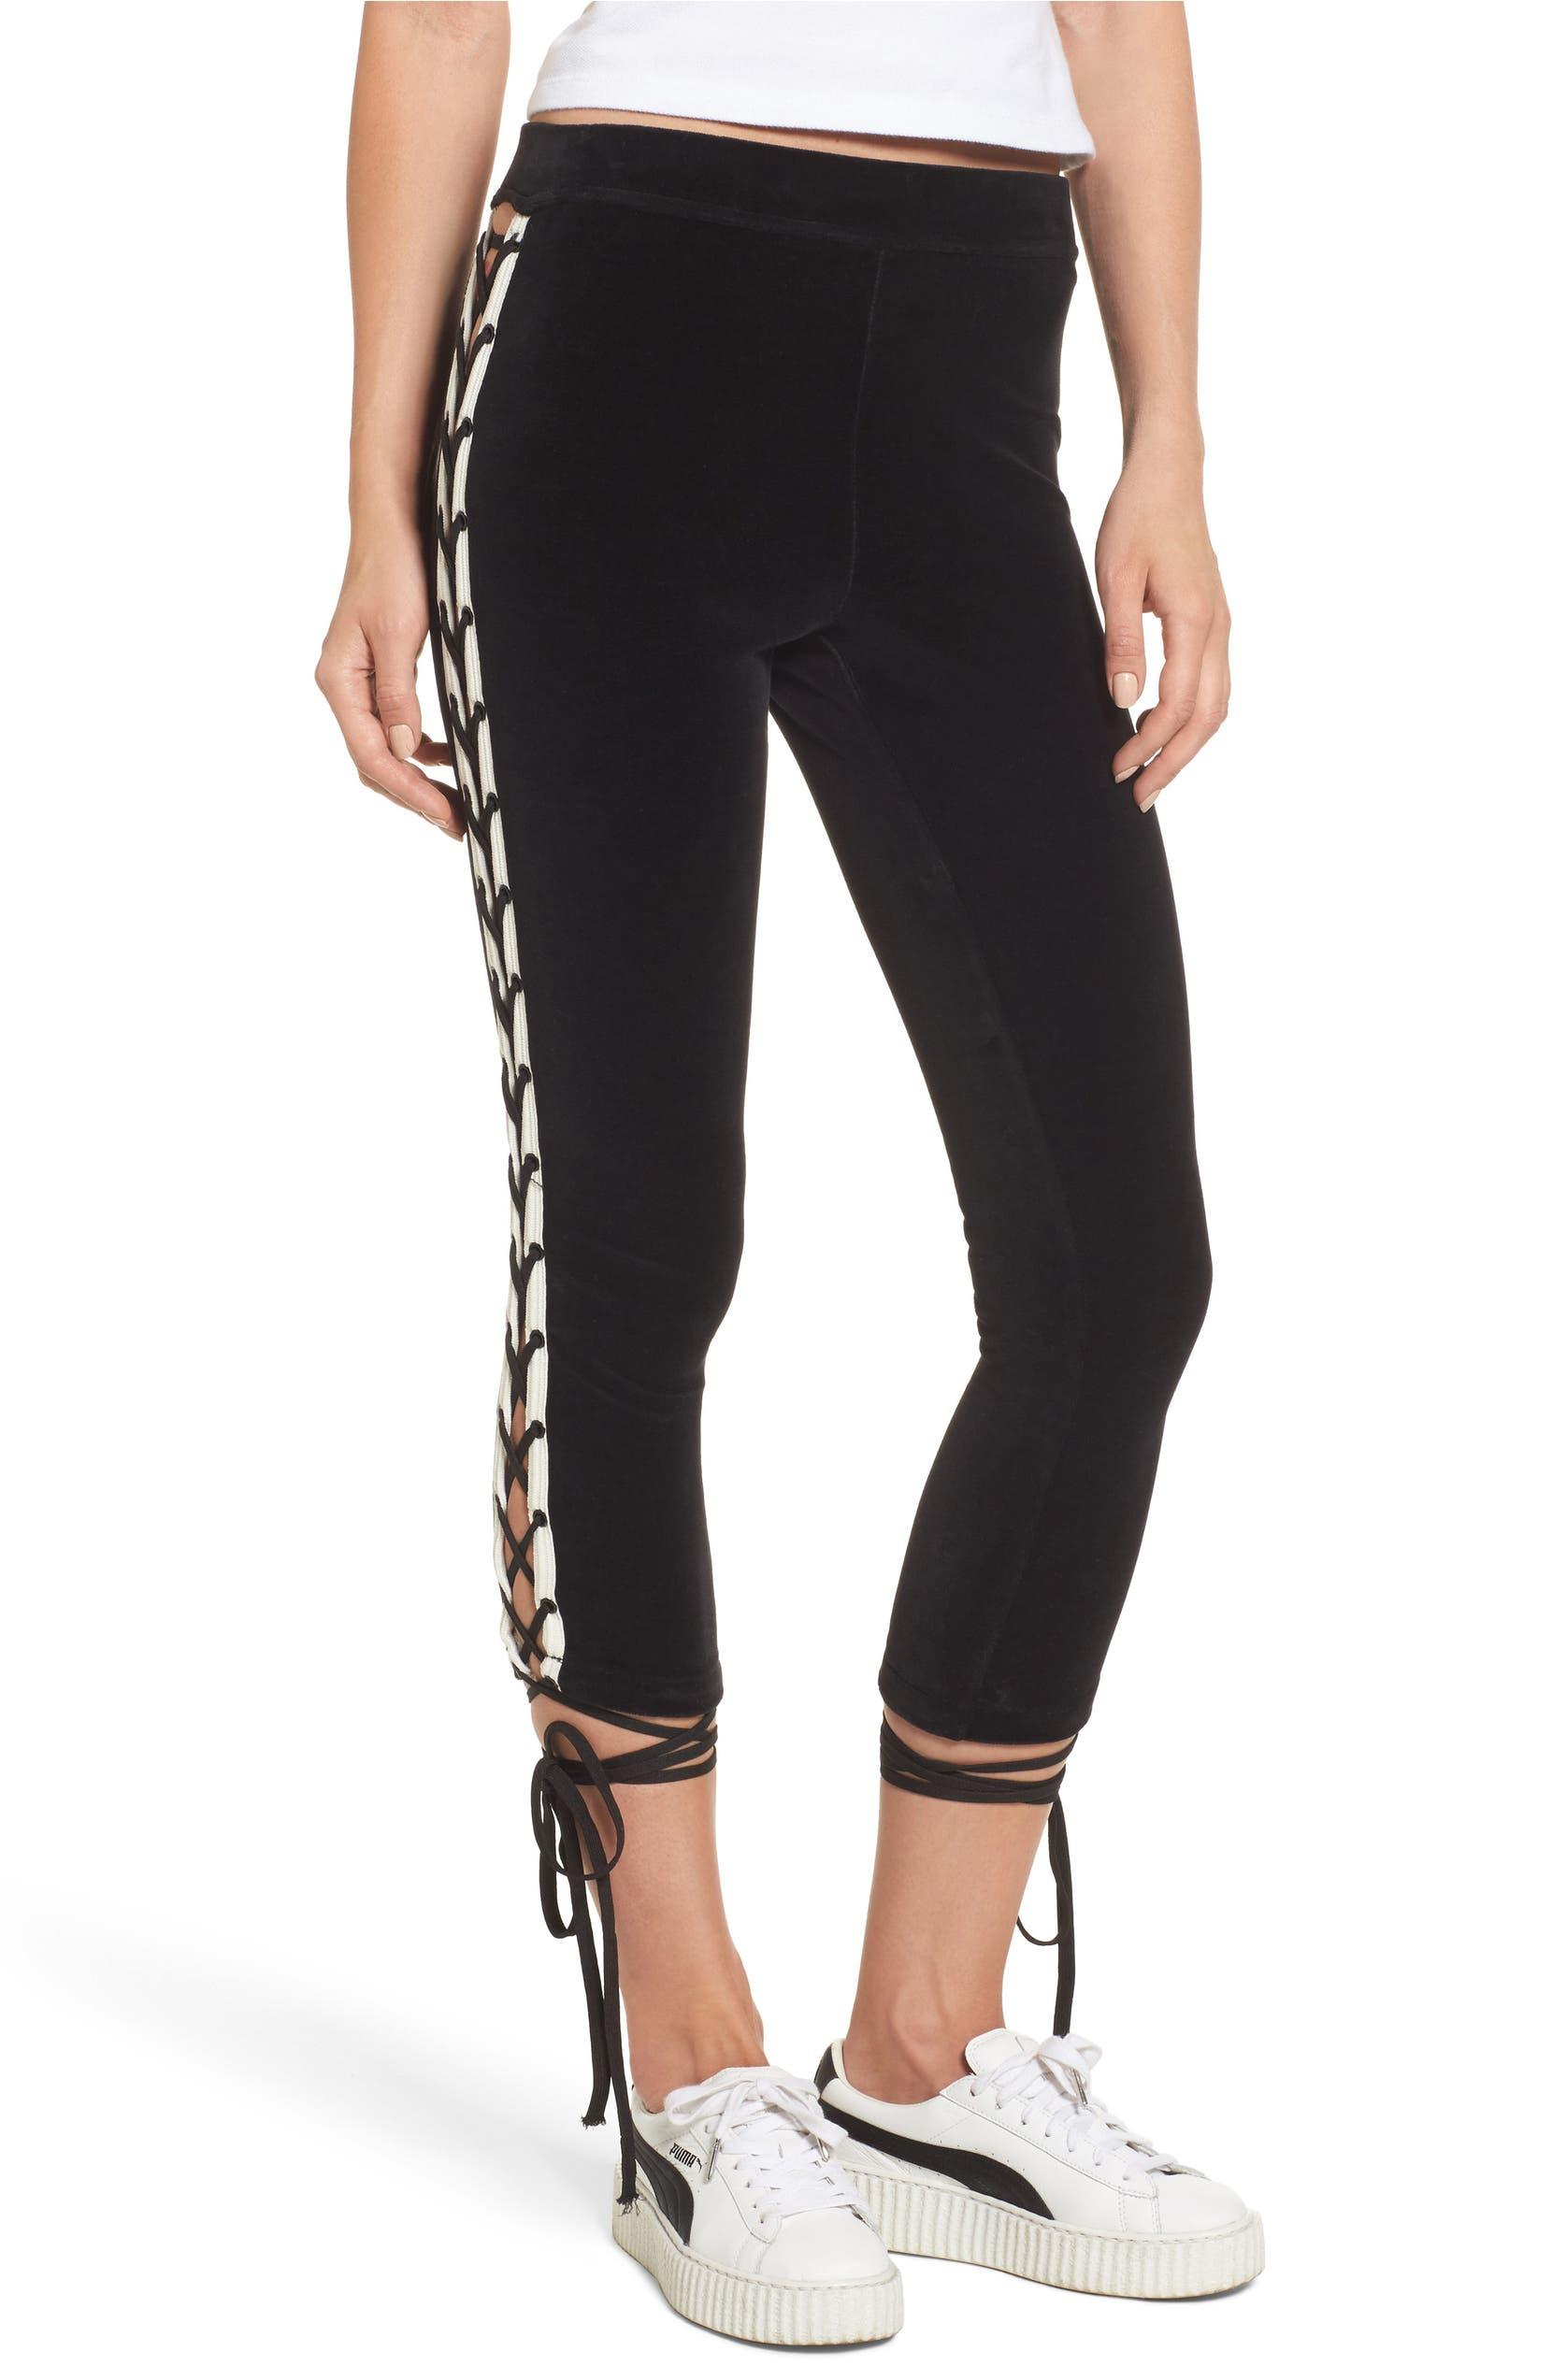 8a1015672c4 PUMA by Rihanna Lace-Up Jogger Pants